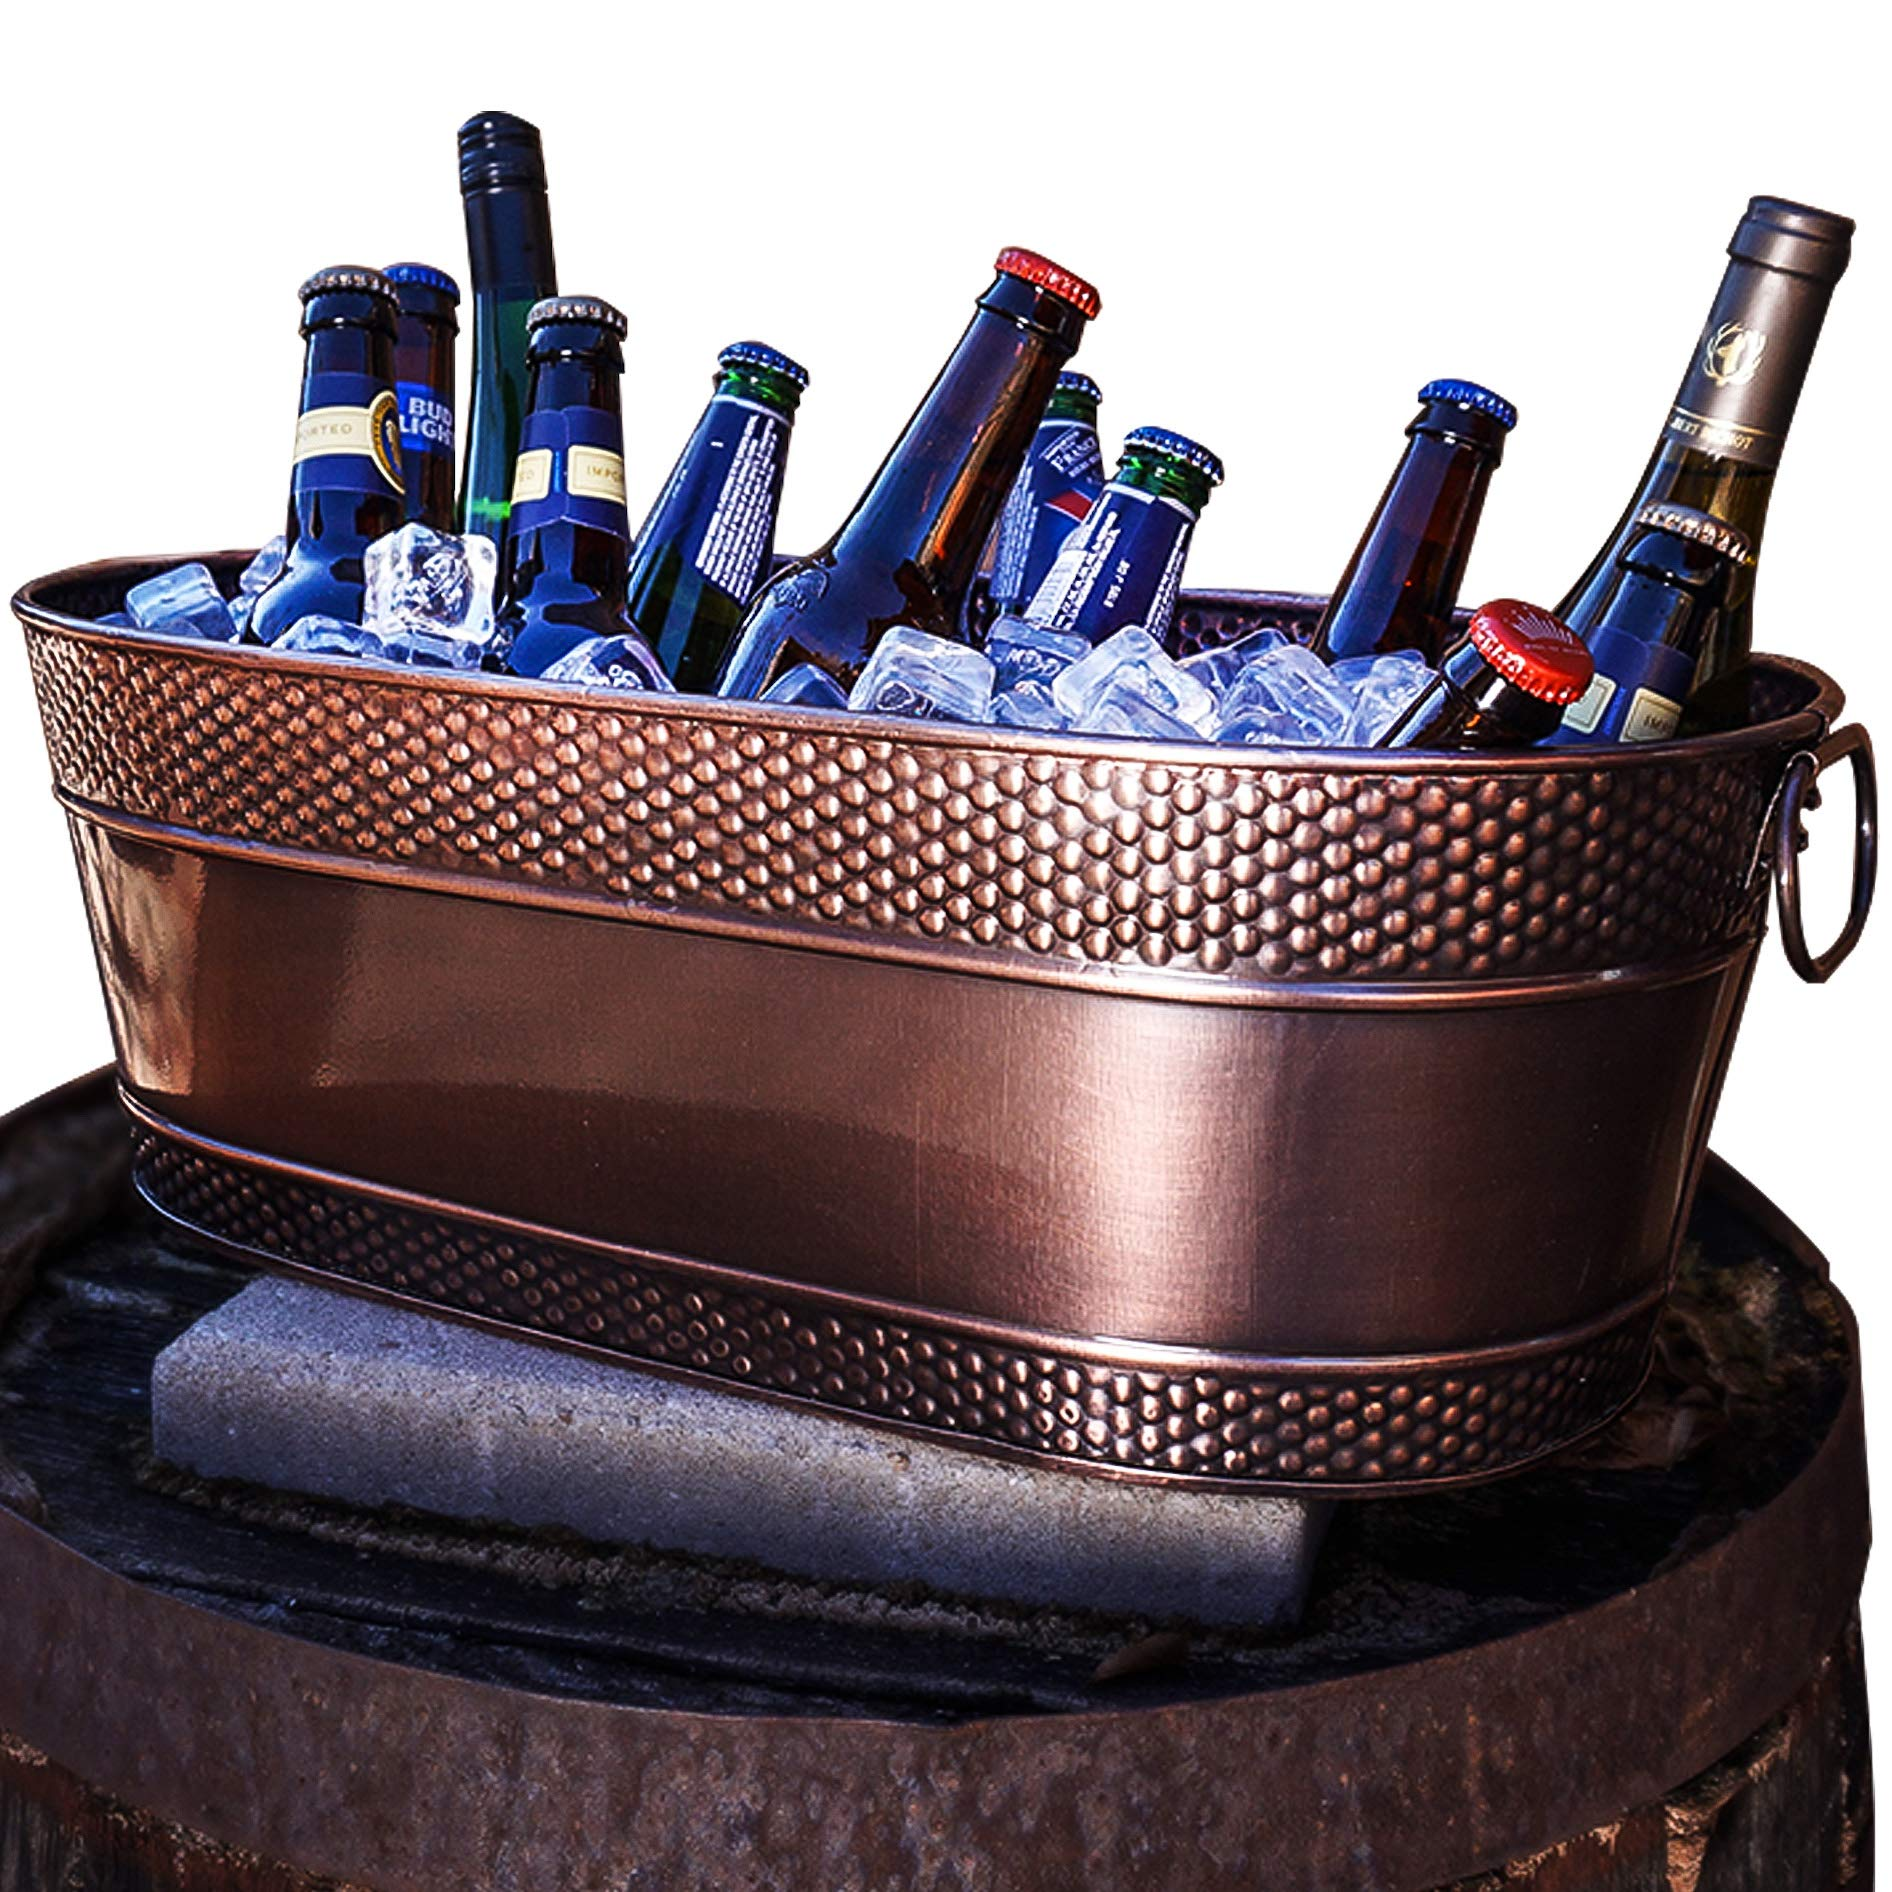 BREKX Colt Copper Finish Hammered Beverage Tub for Parties, Weddings, Registry, Anniversary, Housewarming Gifts - 17 Quart